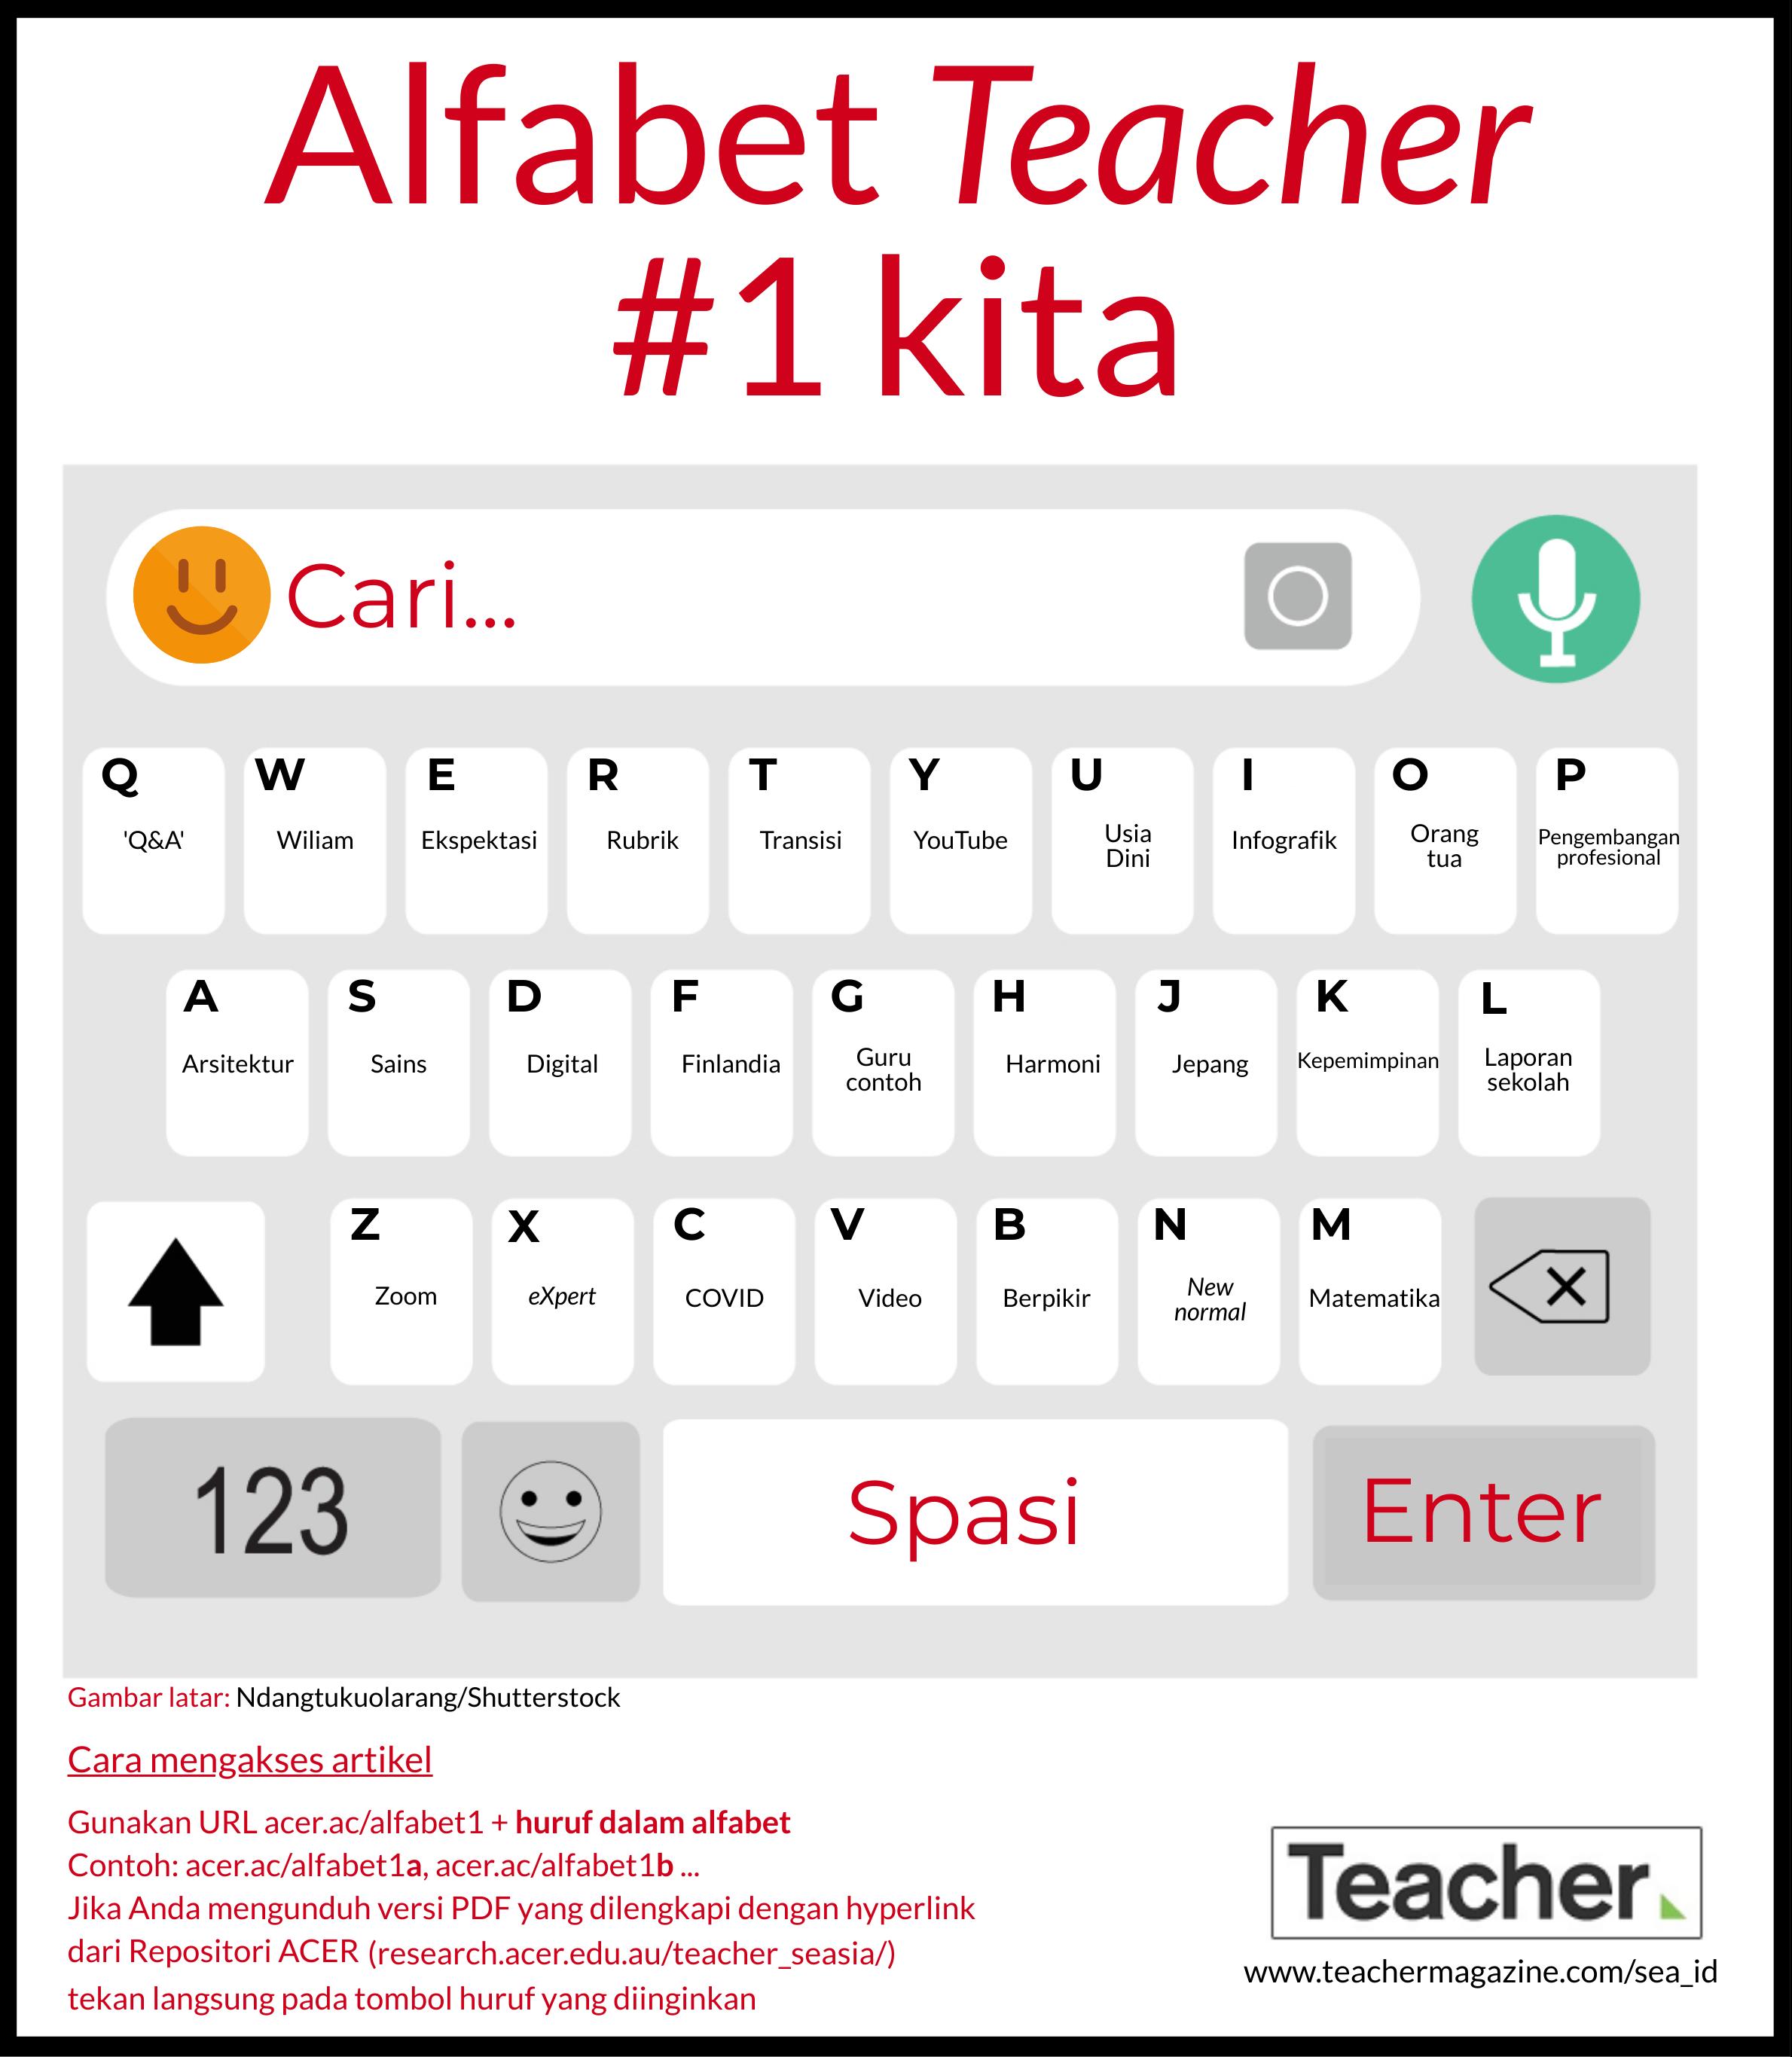 SEA-IN Infographic: My Teacher alphabet #1